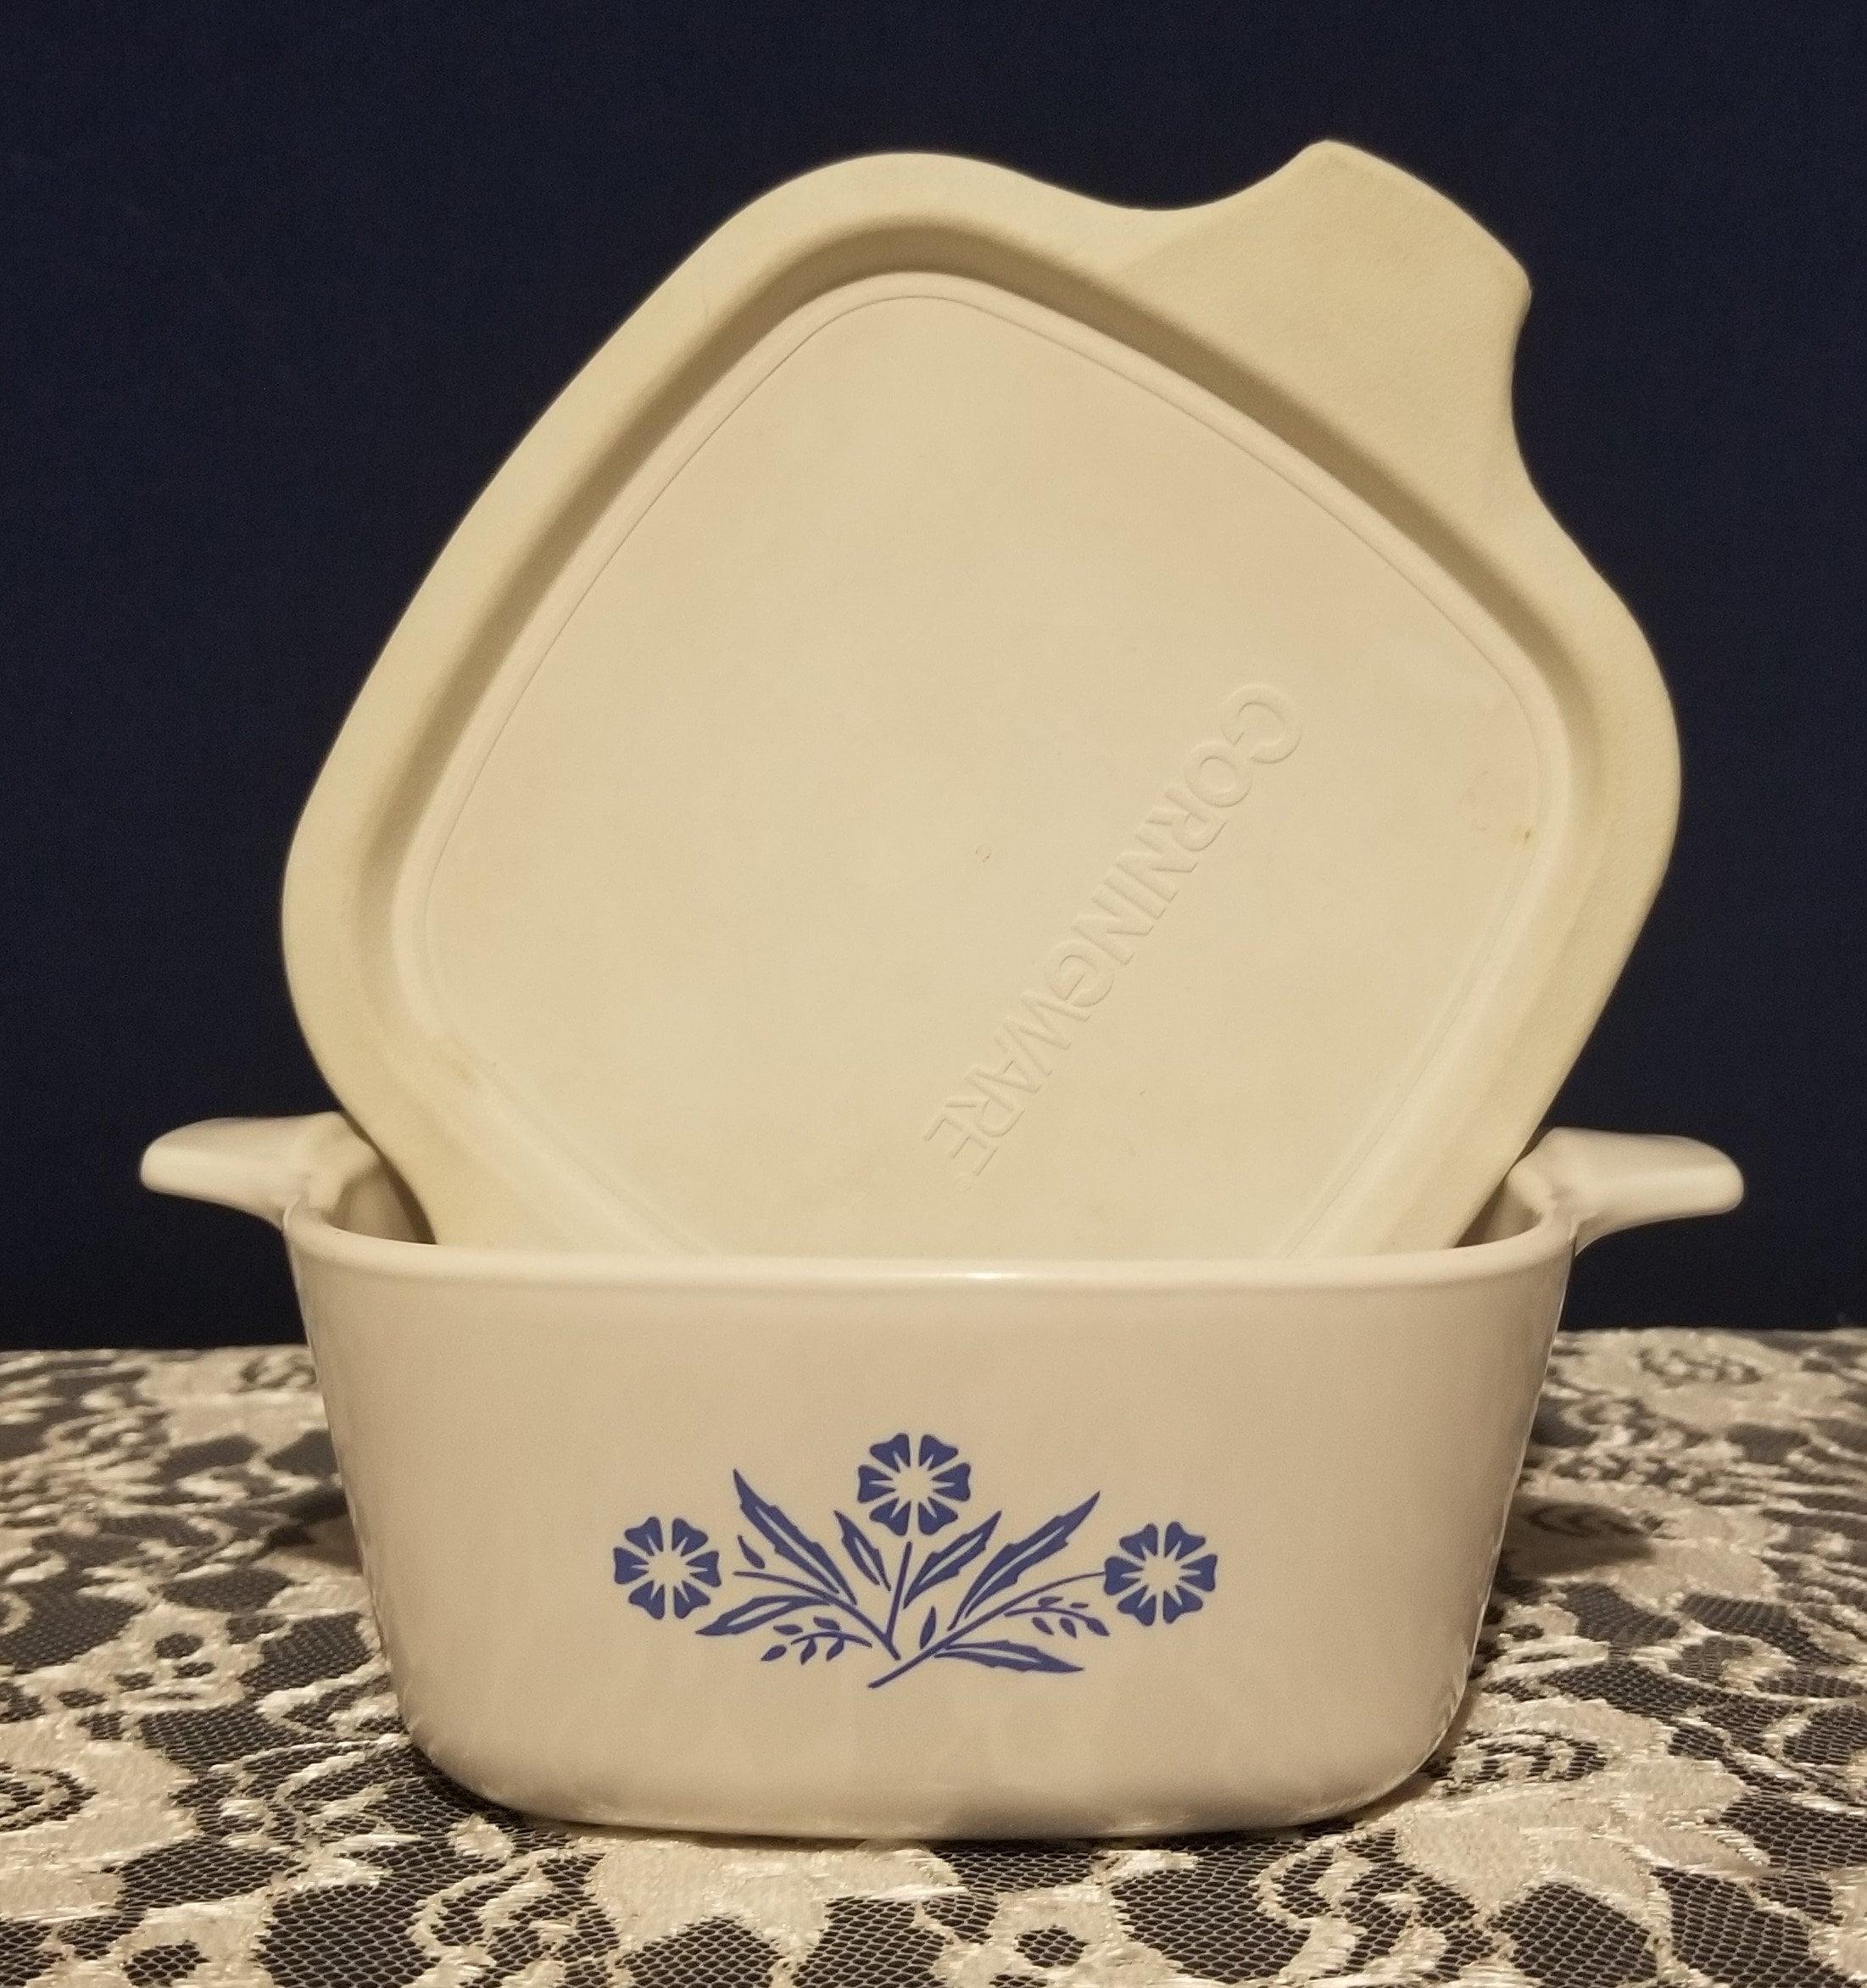 Corningware Blue Cornflower Dish With Plastic Lid Etsy